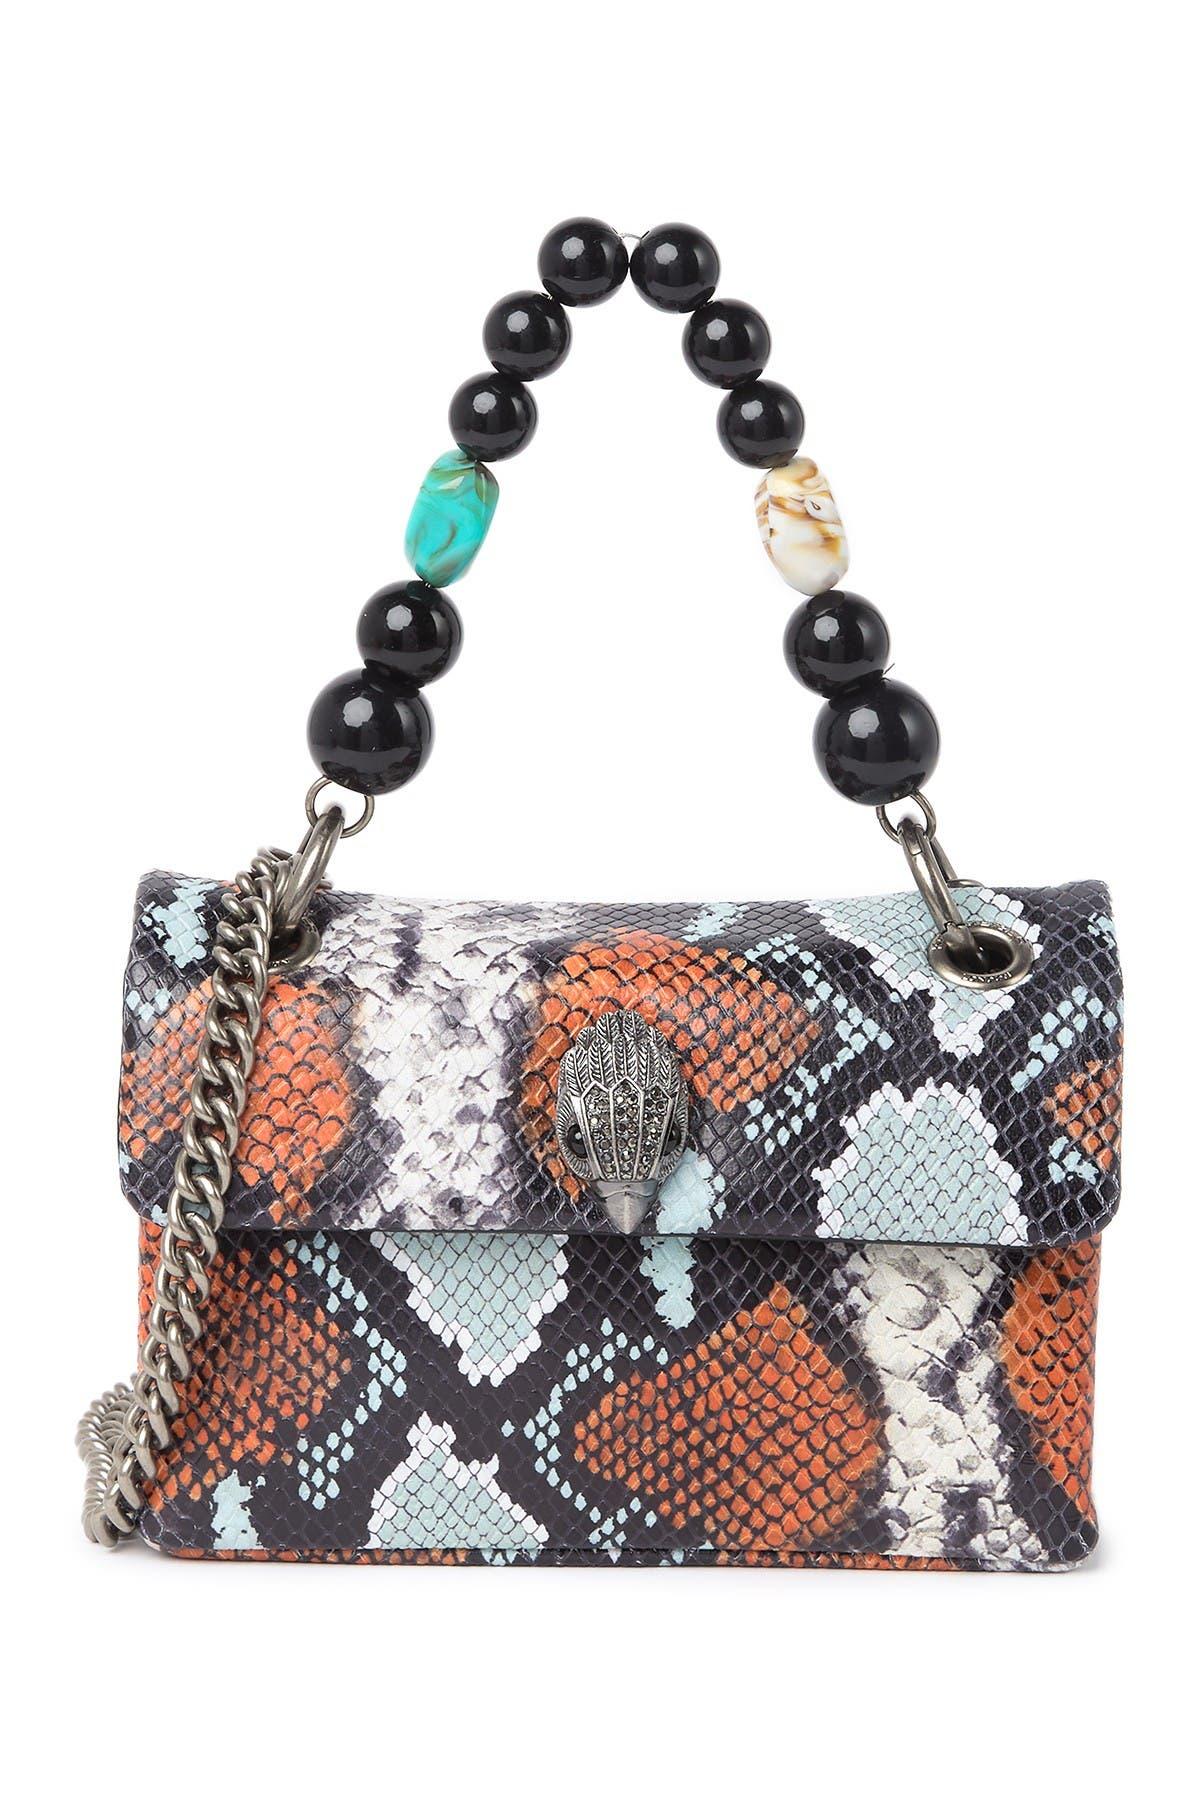 Image of Kurt Geiger London Mini Kensington Crossbody Bag